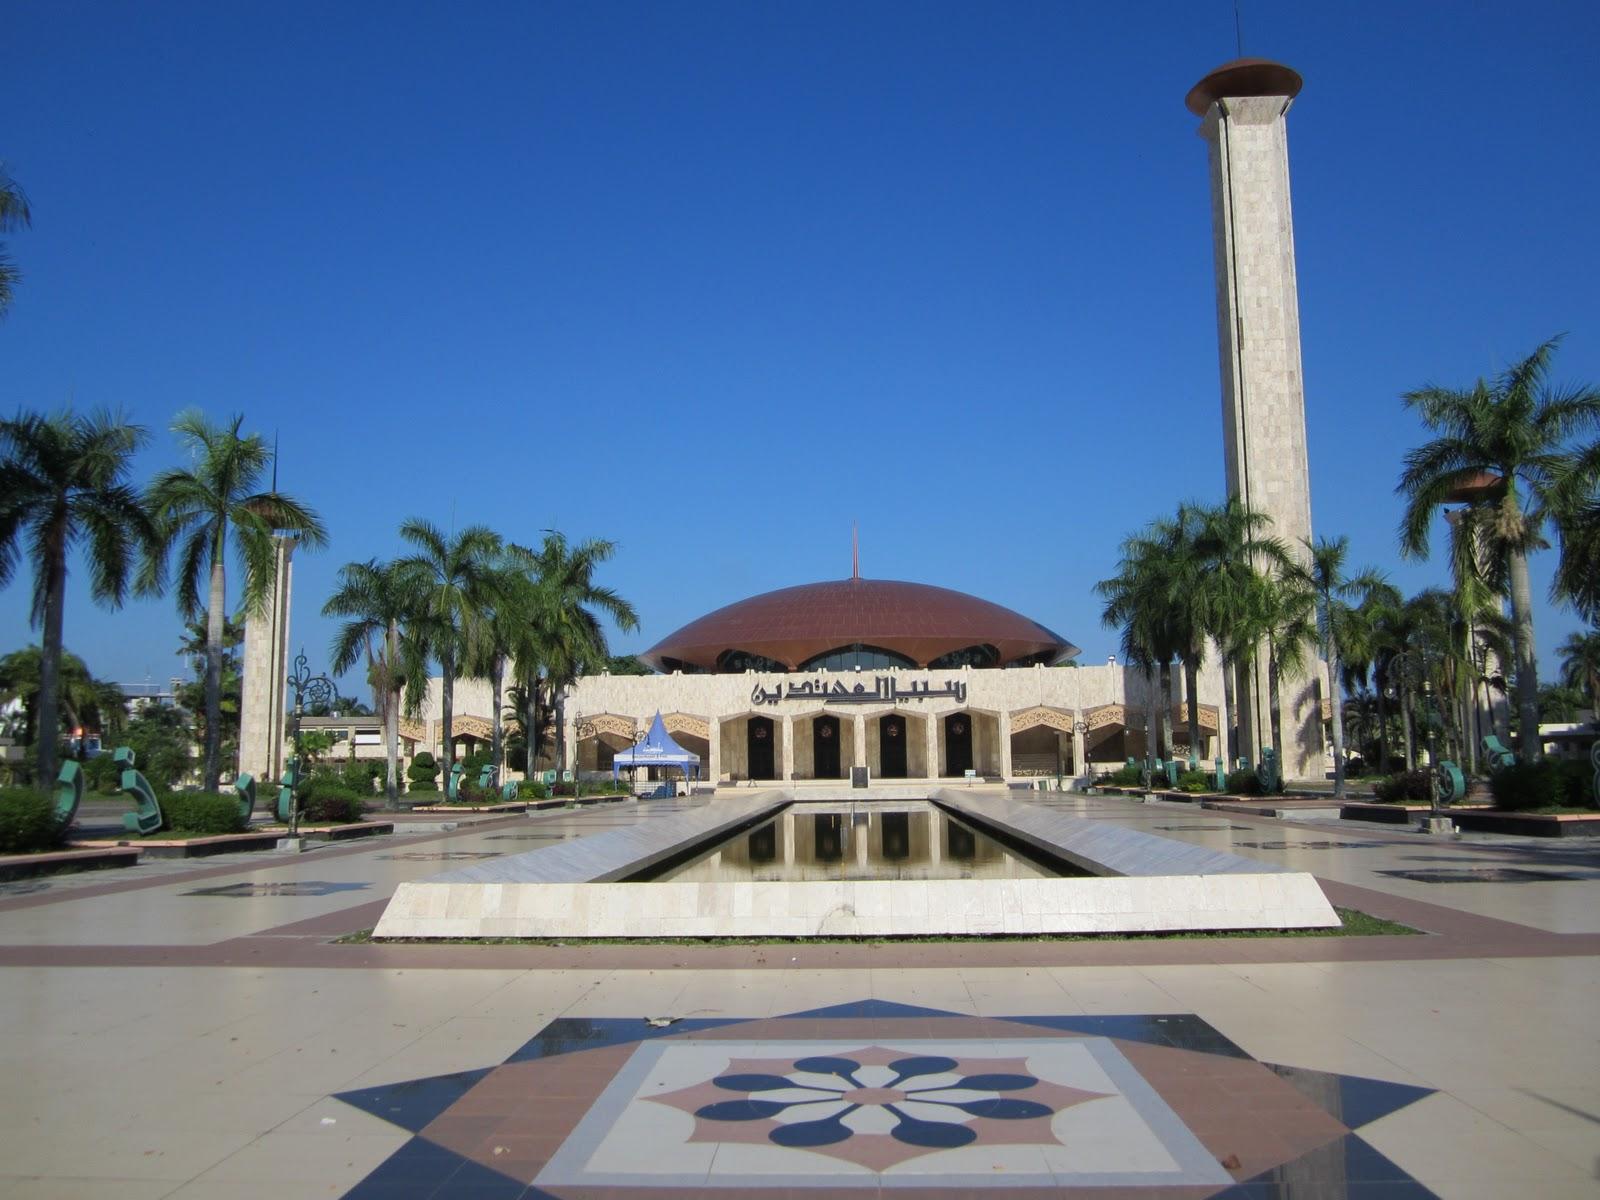 Masjid Raya Sabilal Muhtadin Besar Jantung Kota Banjarmasin Mosque Indonesia